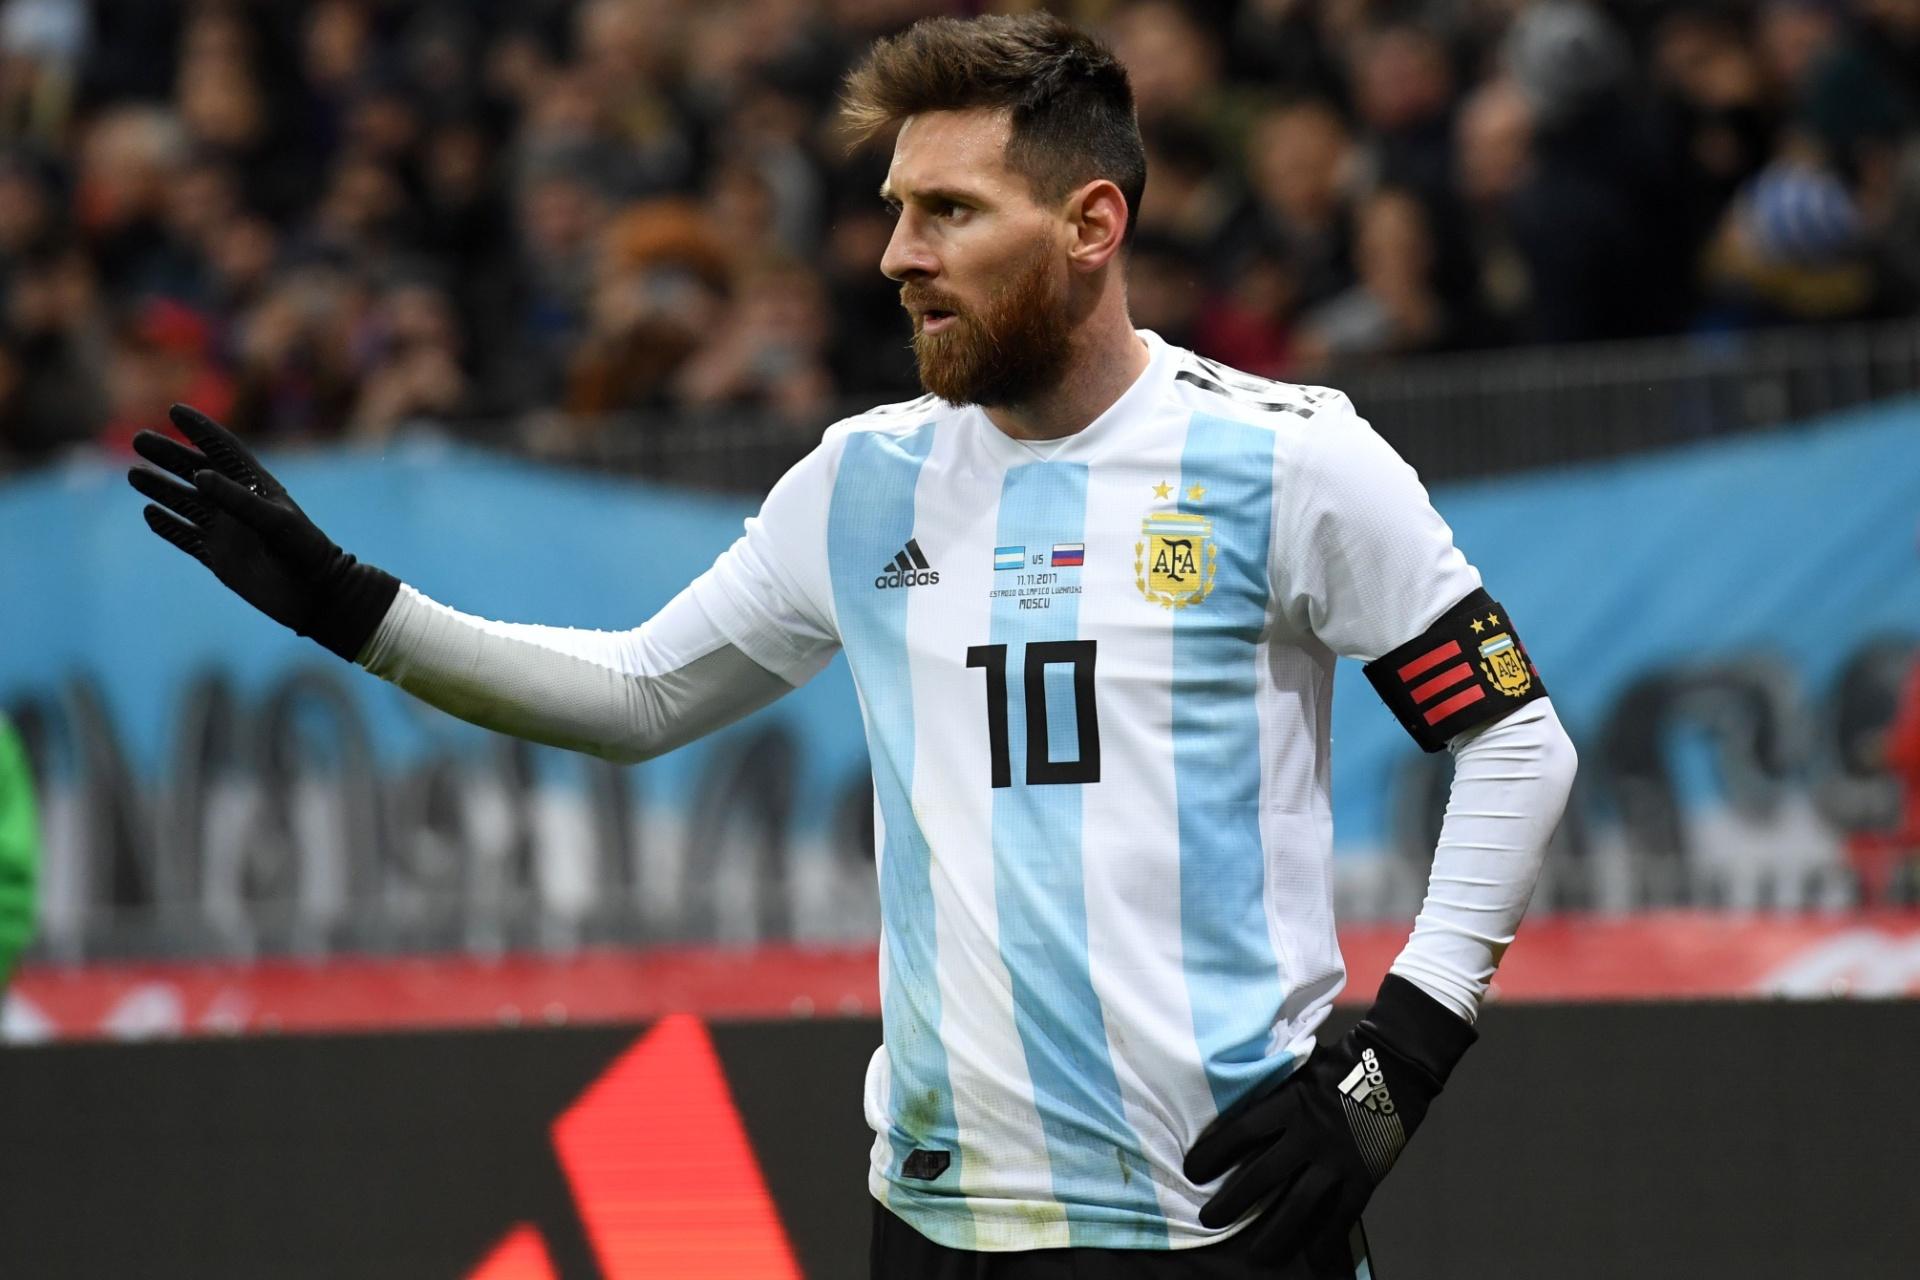 7e98a916bd Batistuta se sente mal por ter perdido artilharia da Argentina para Messi -  Esporte - BOL